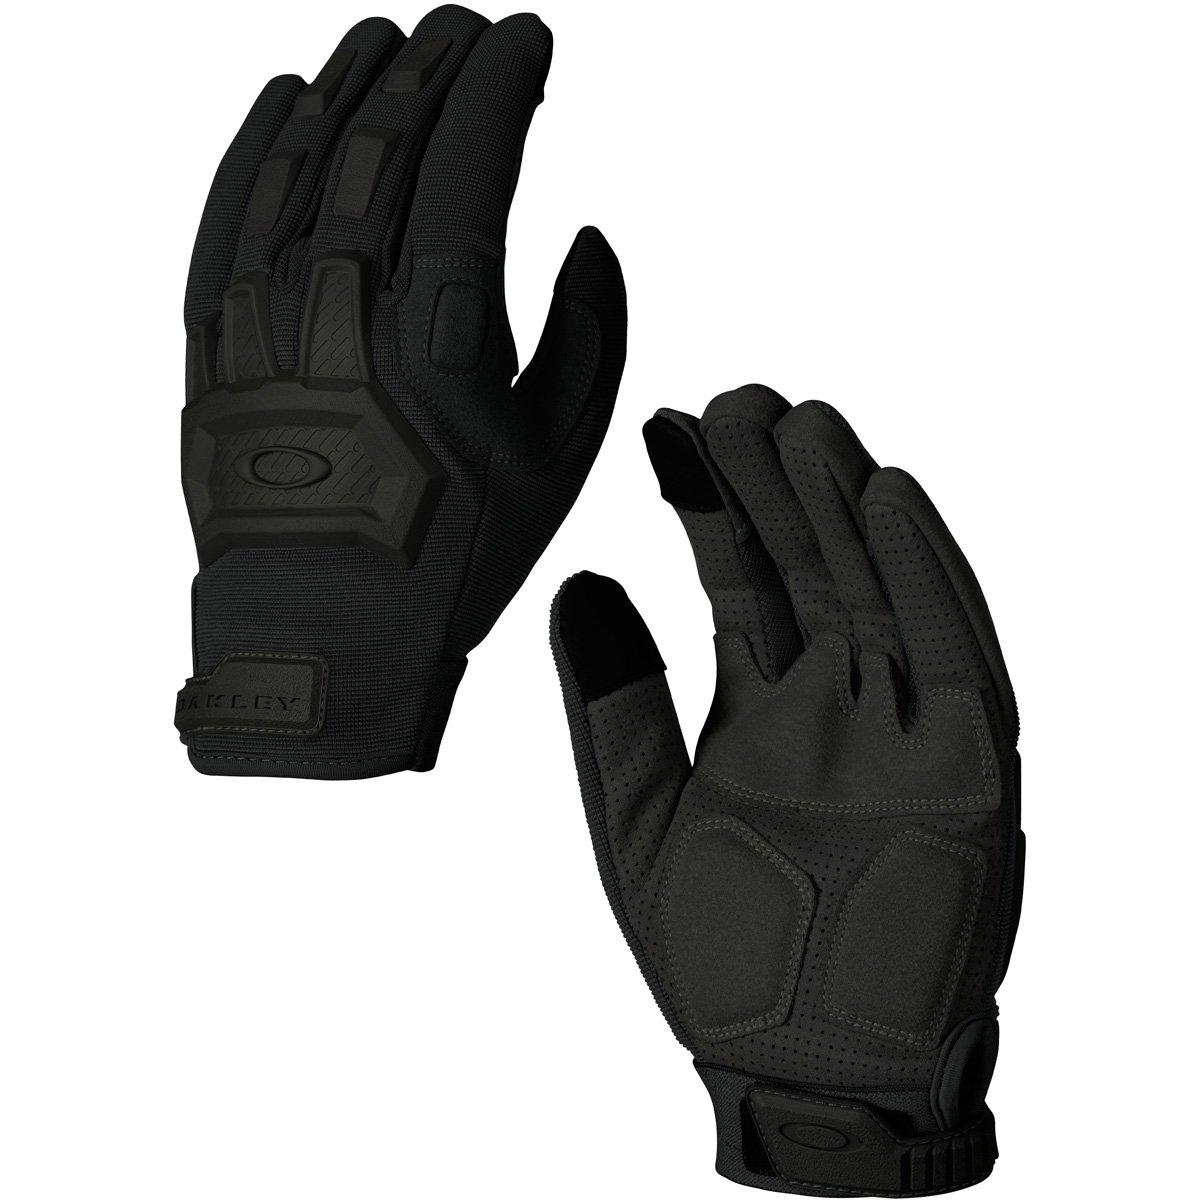 ac8372e2071 Amazon.com  Oakley Mens Flexion Glove